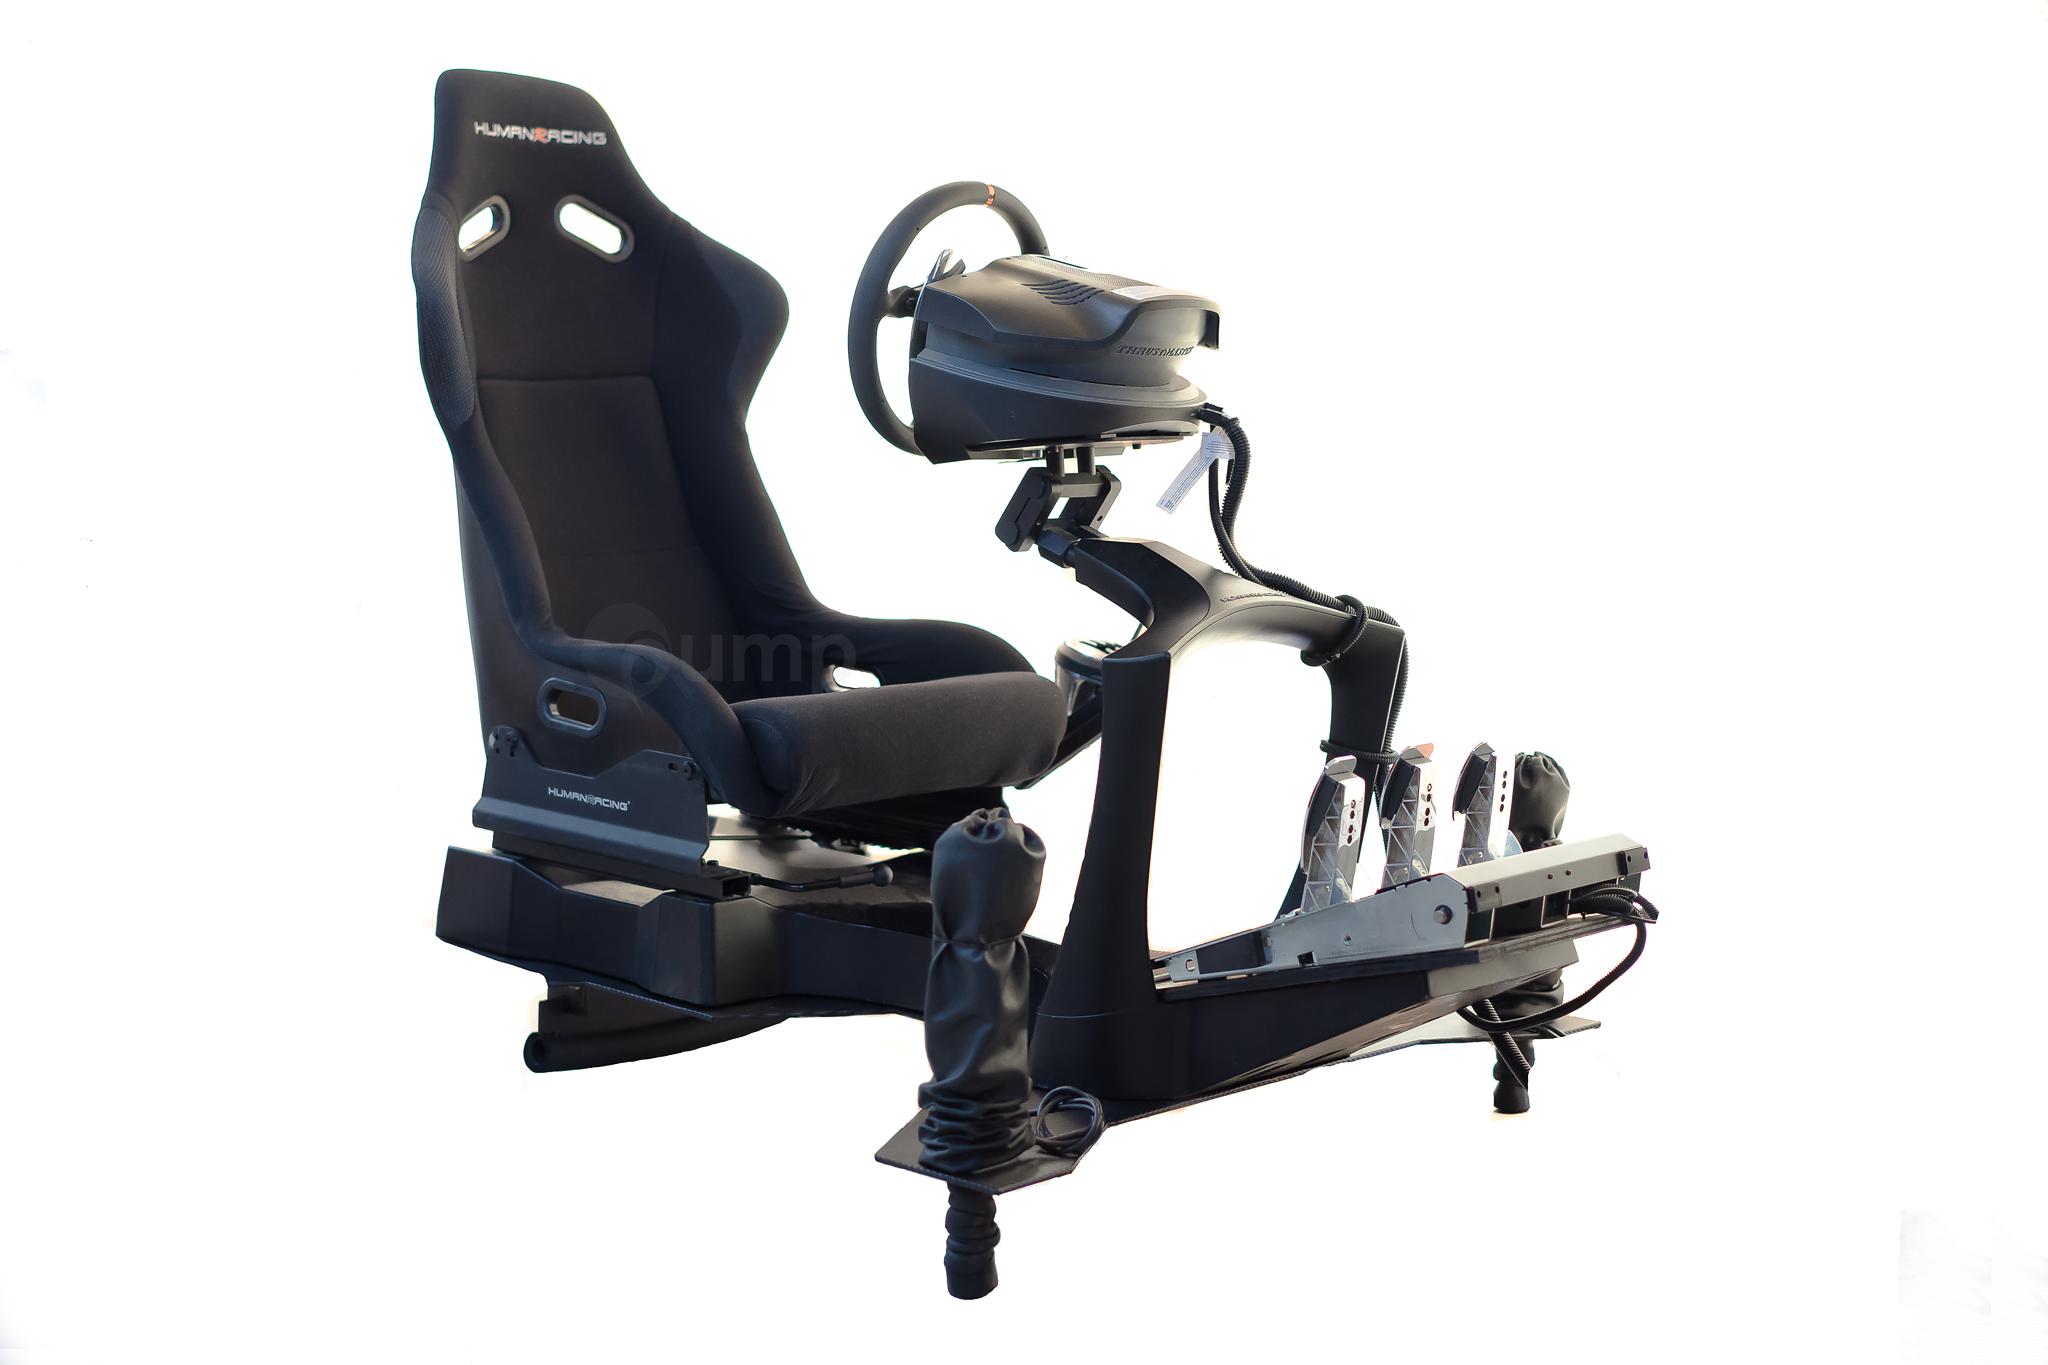 imotion street dof 2 car simulator 149 imotion street dof. Black Bedroom Furniture Sets. Home Design Ideas